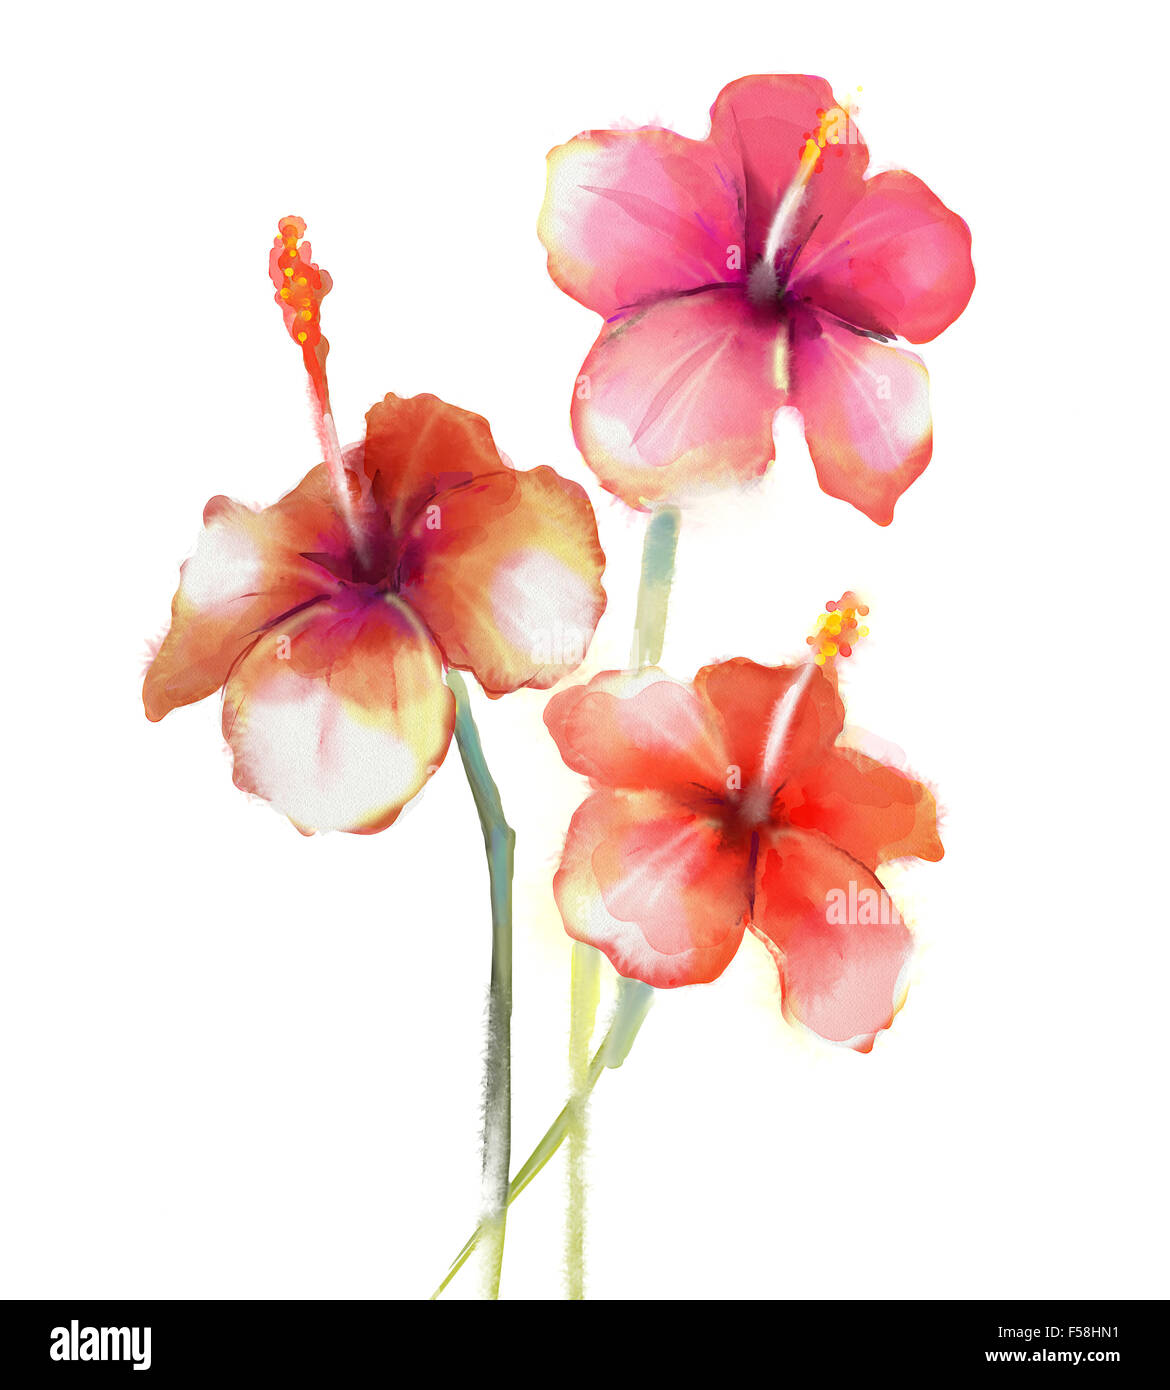 Pfingstrose Blumen Malerei Auf Vase Aus Keramik Stockfotos